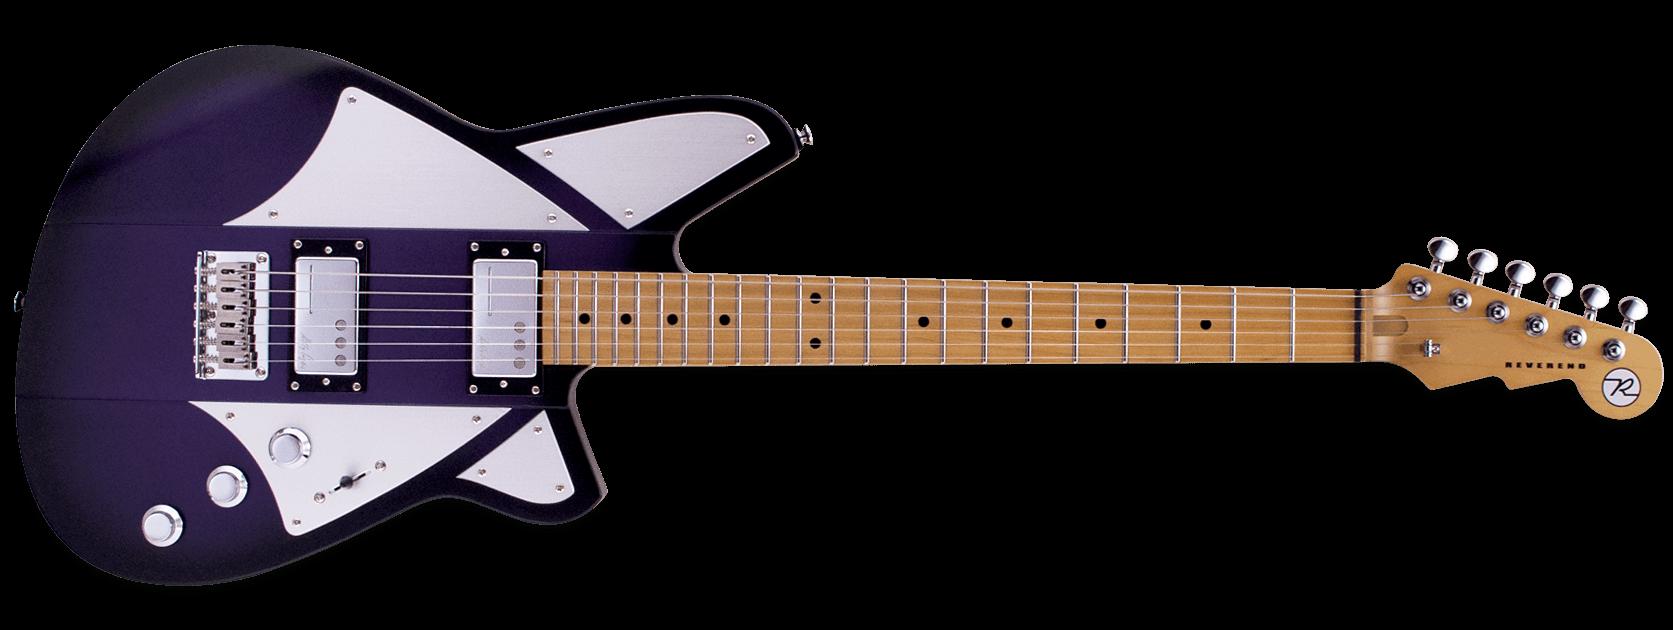 Reverend Billy Corgan BC1 Satin Purple Burst